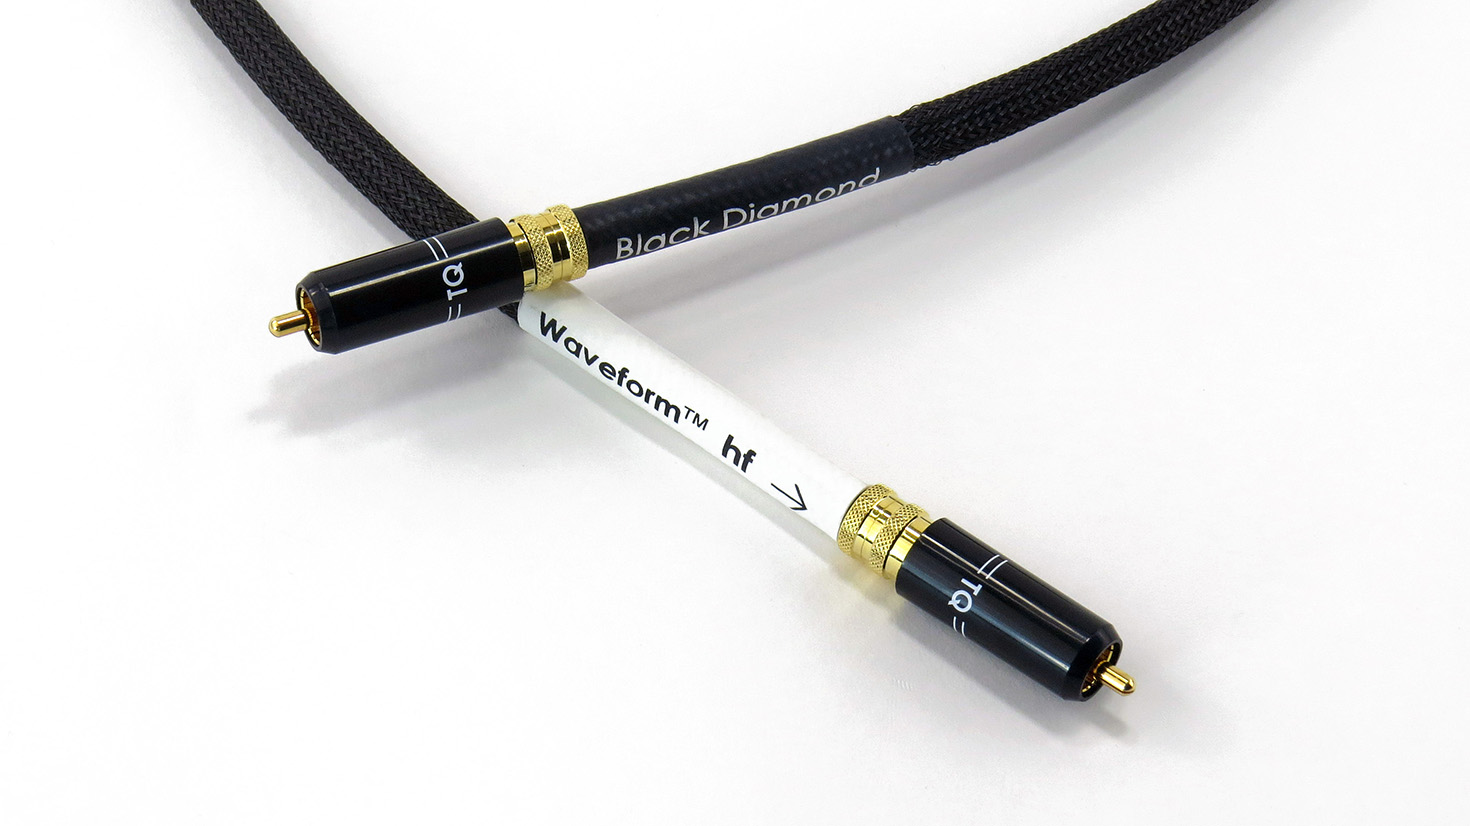 Black Diamond Waveform hf Digital RCA Cable